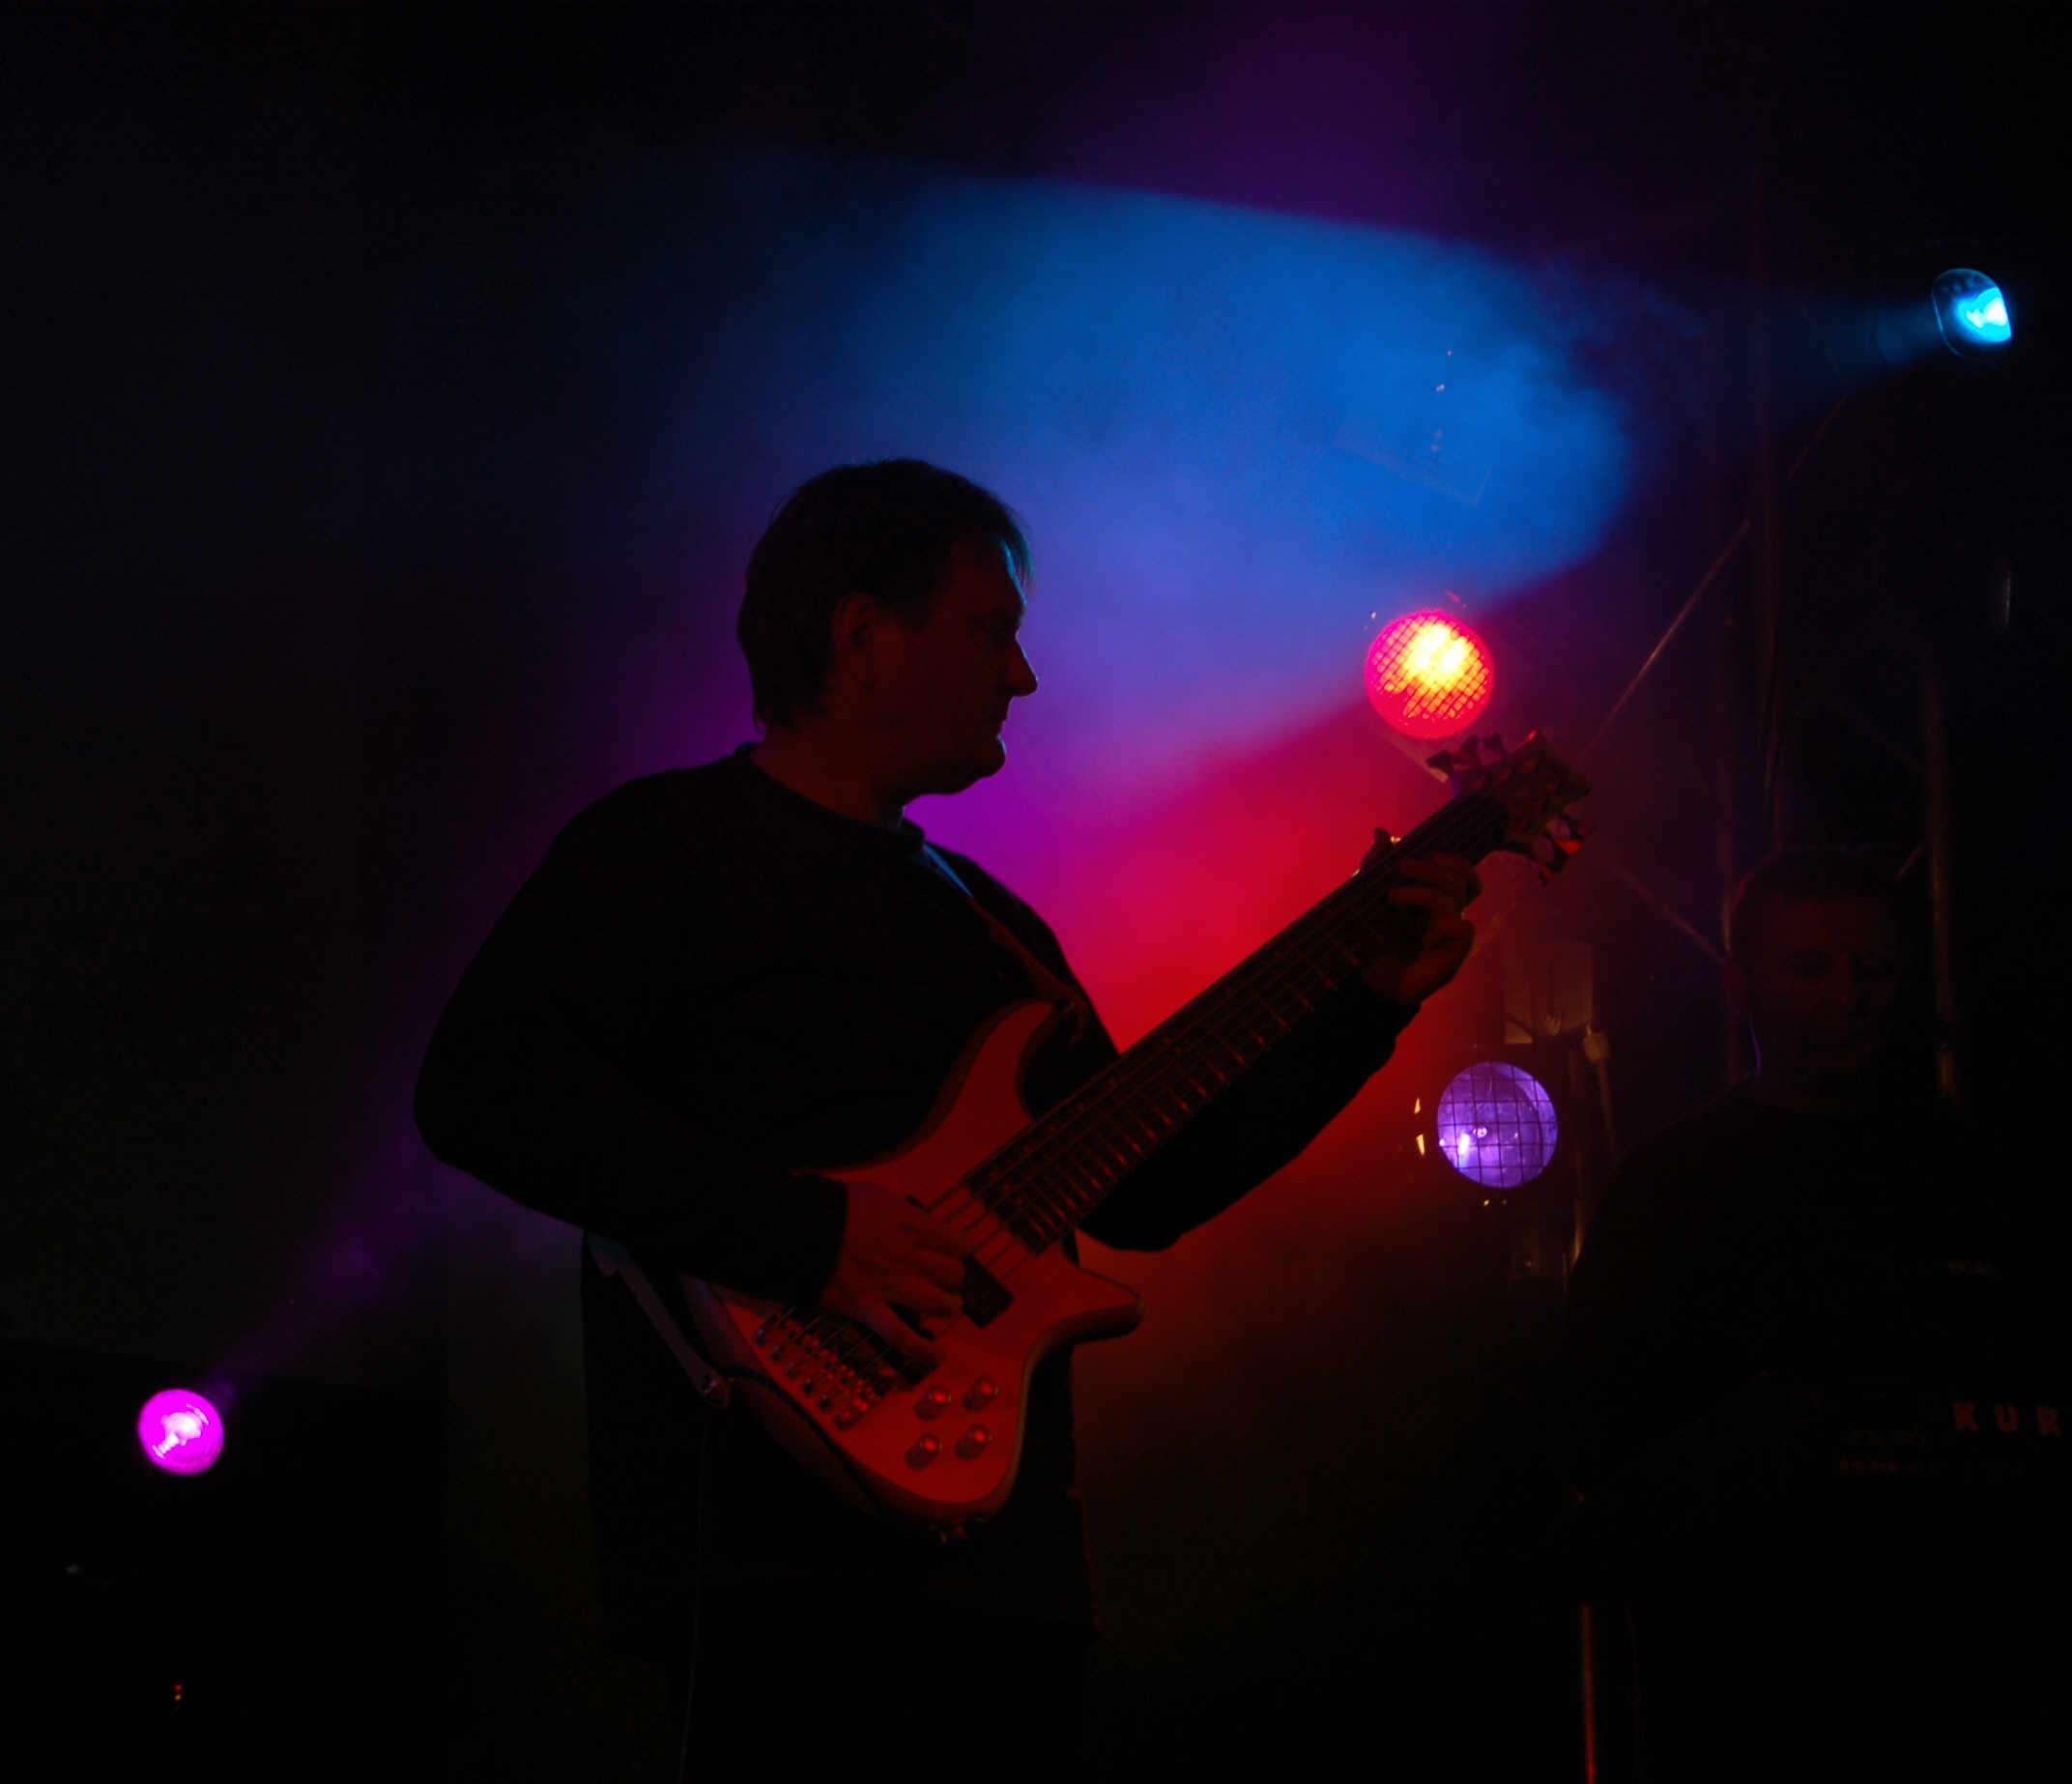 Sándor Pocsai on bass guitar